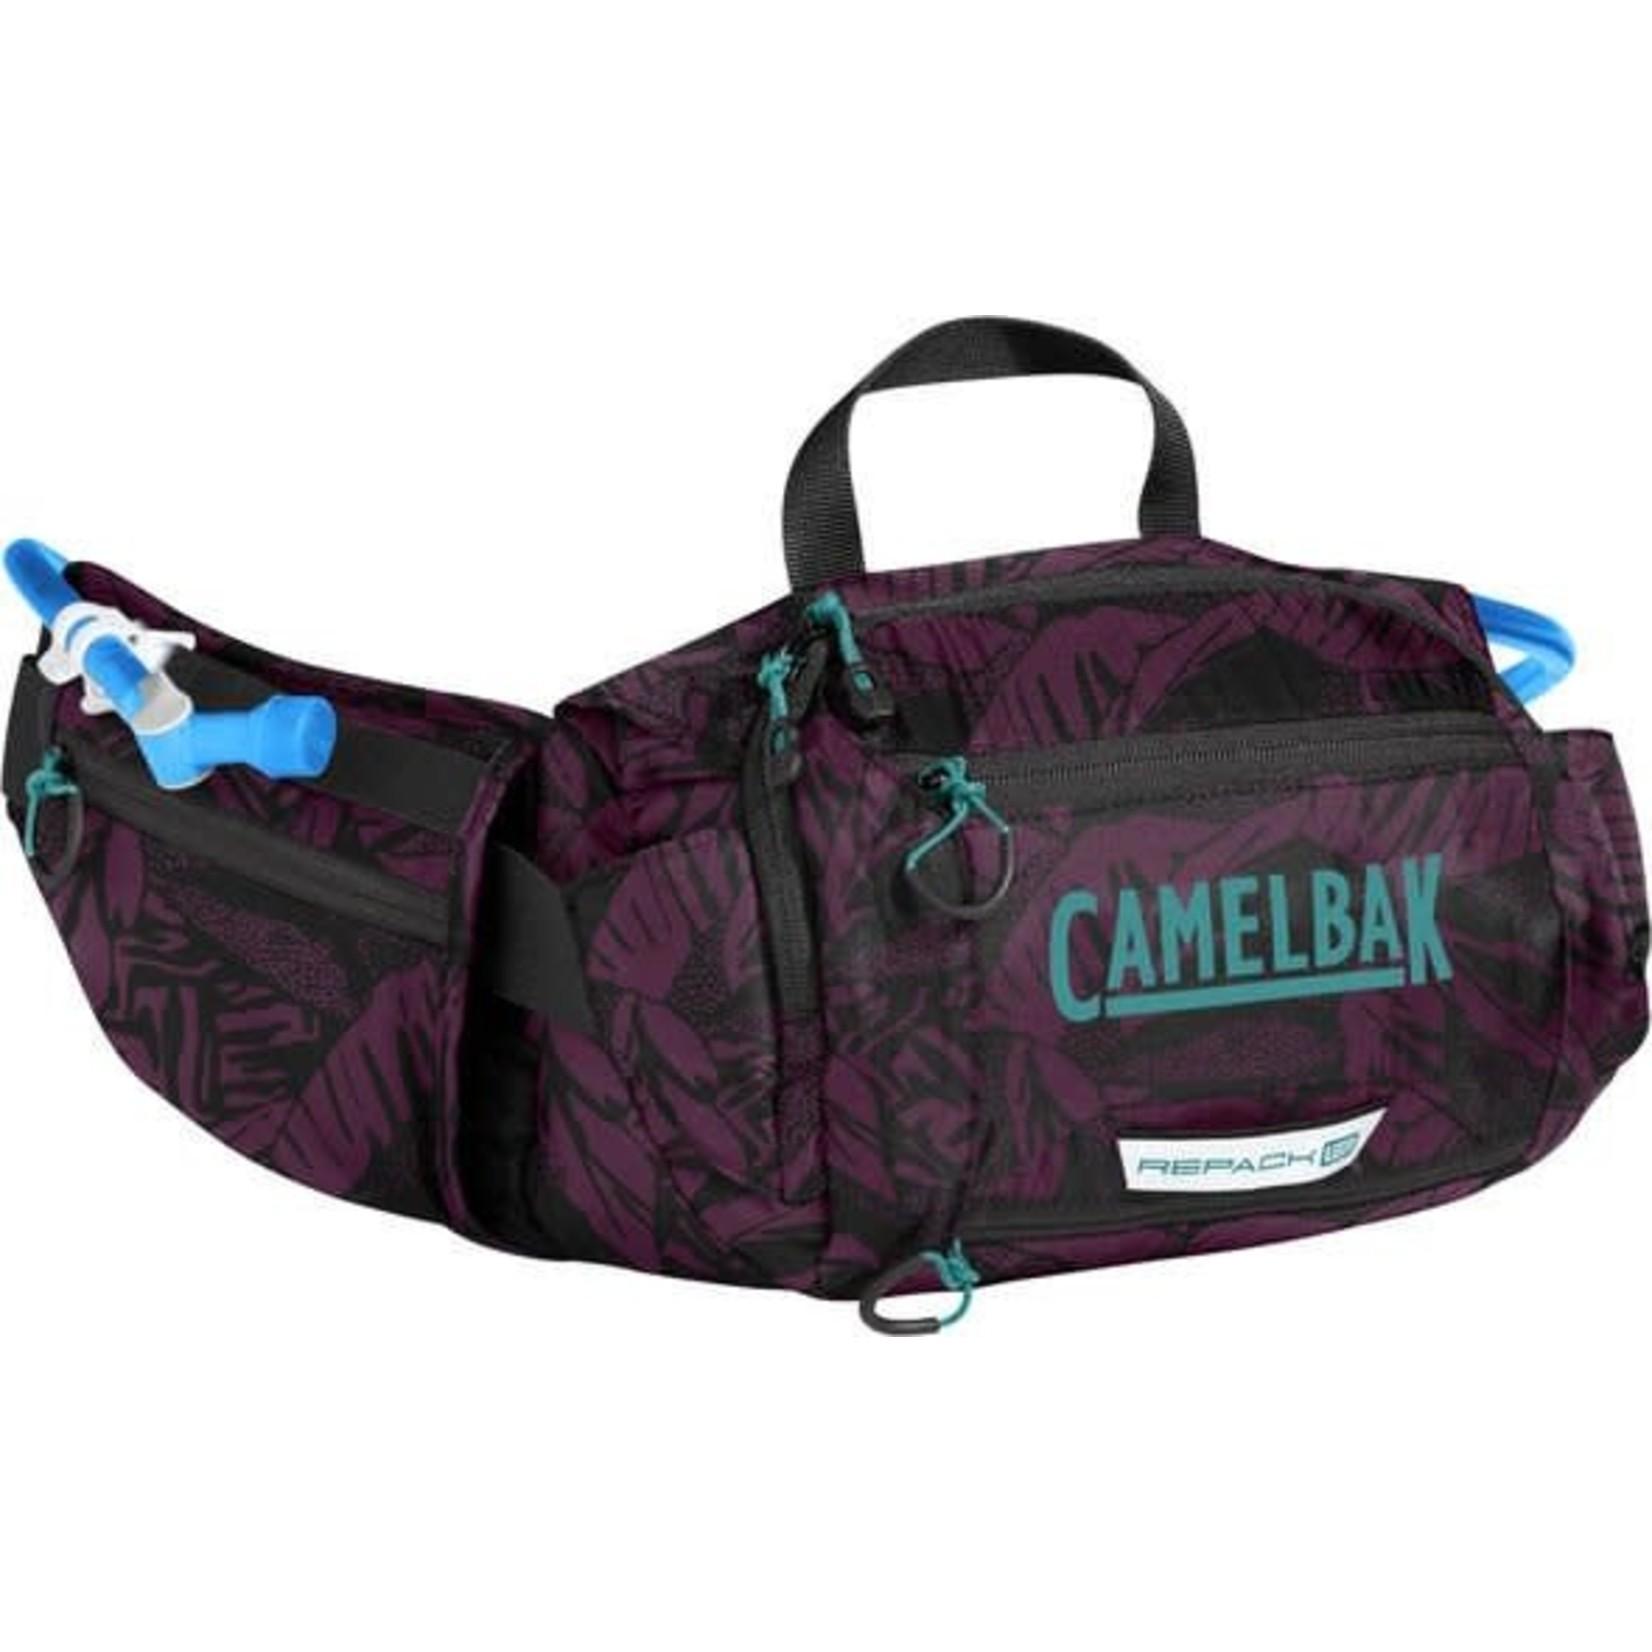 CAMELBAK Hip Pack, Repack LR 4, 50oz, Plum / Black